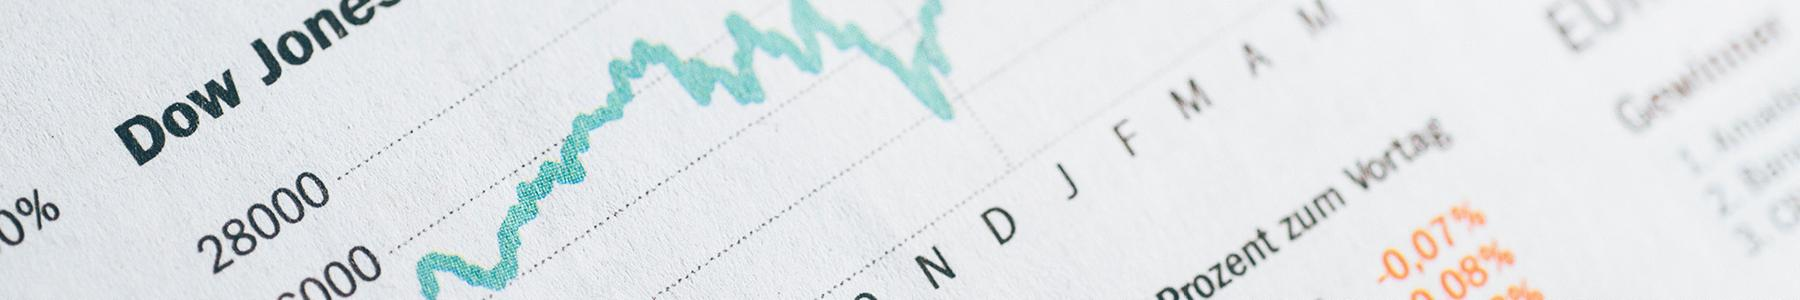 First Quarter 2020: Market Newsletter Thumbnail